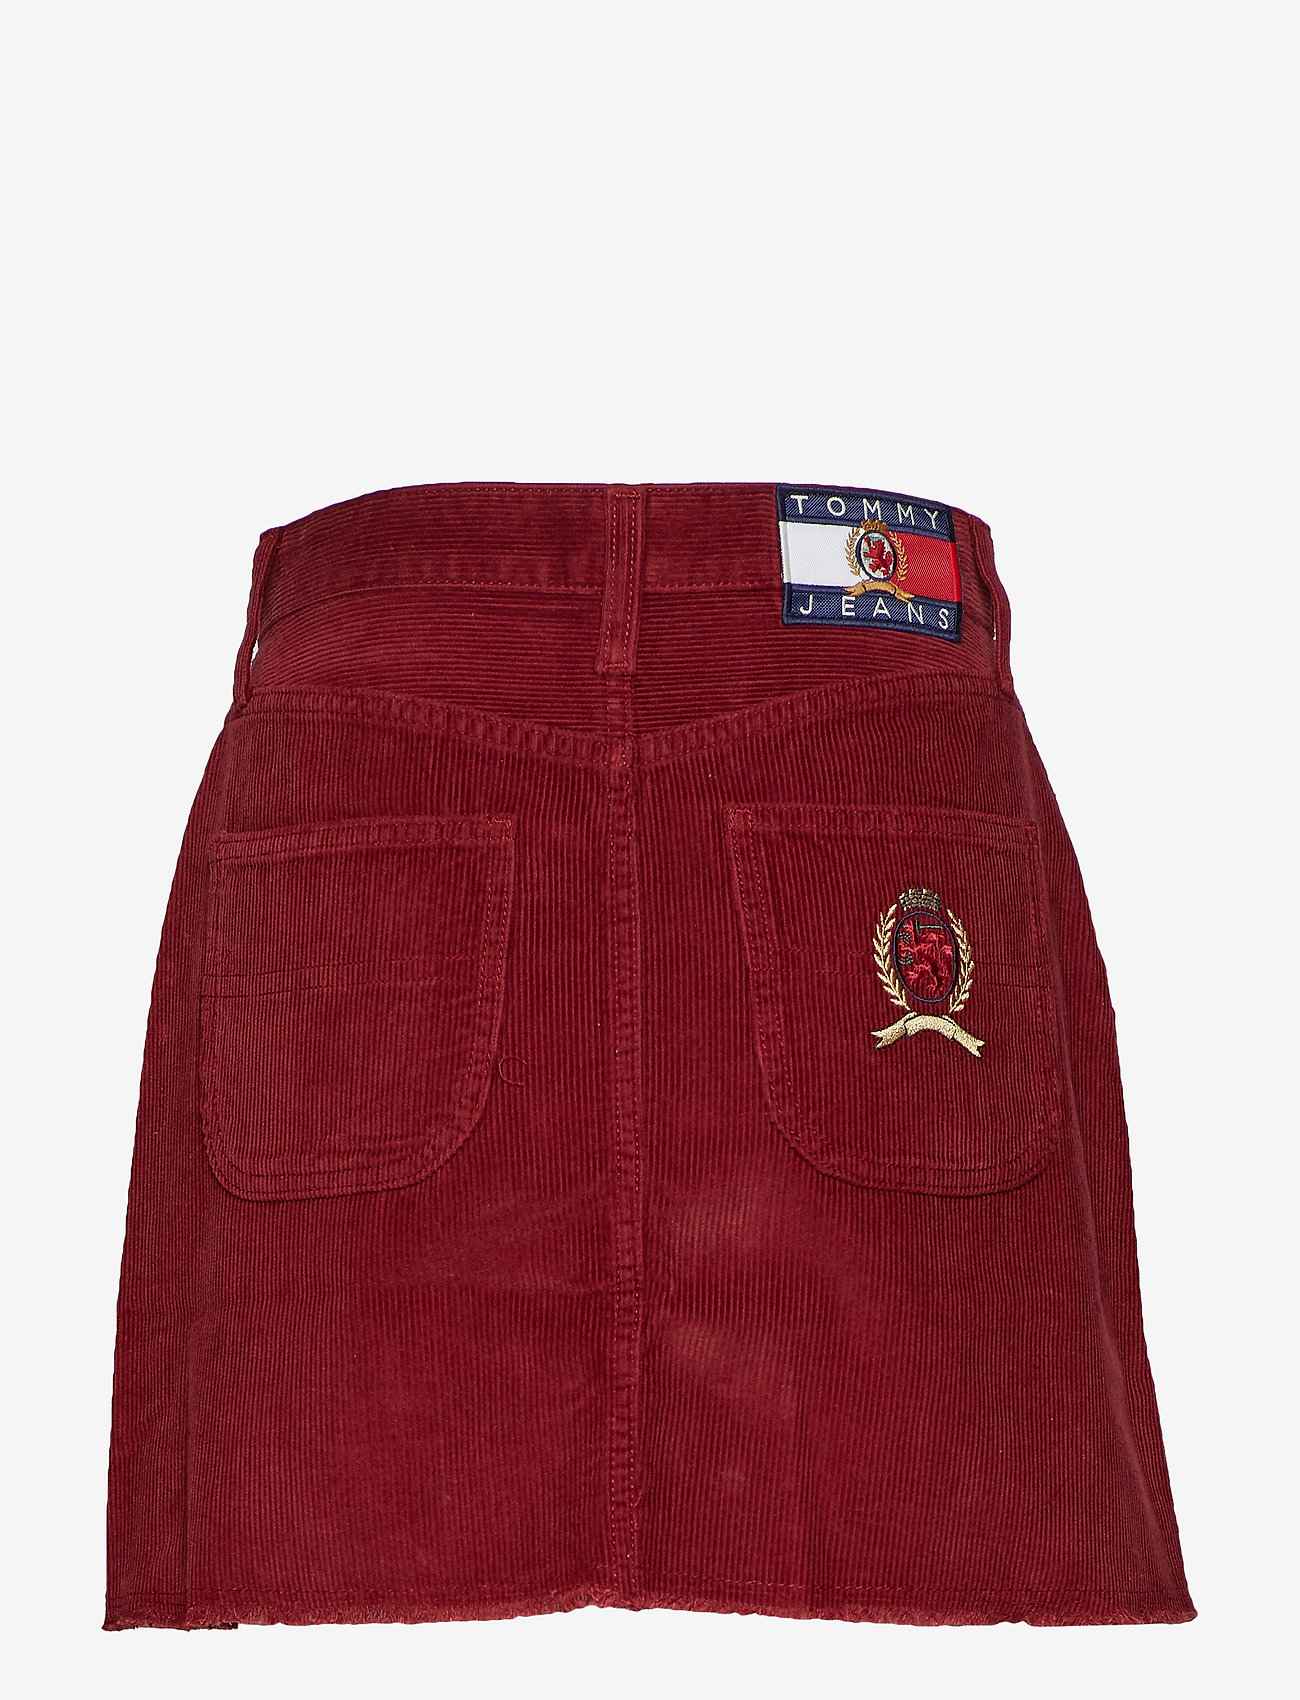 Tommy Jeans - TJW CREST SKIRT W17, - korta kjolar - cabernet - 1